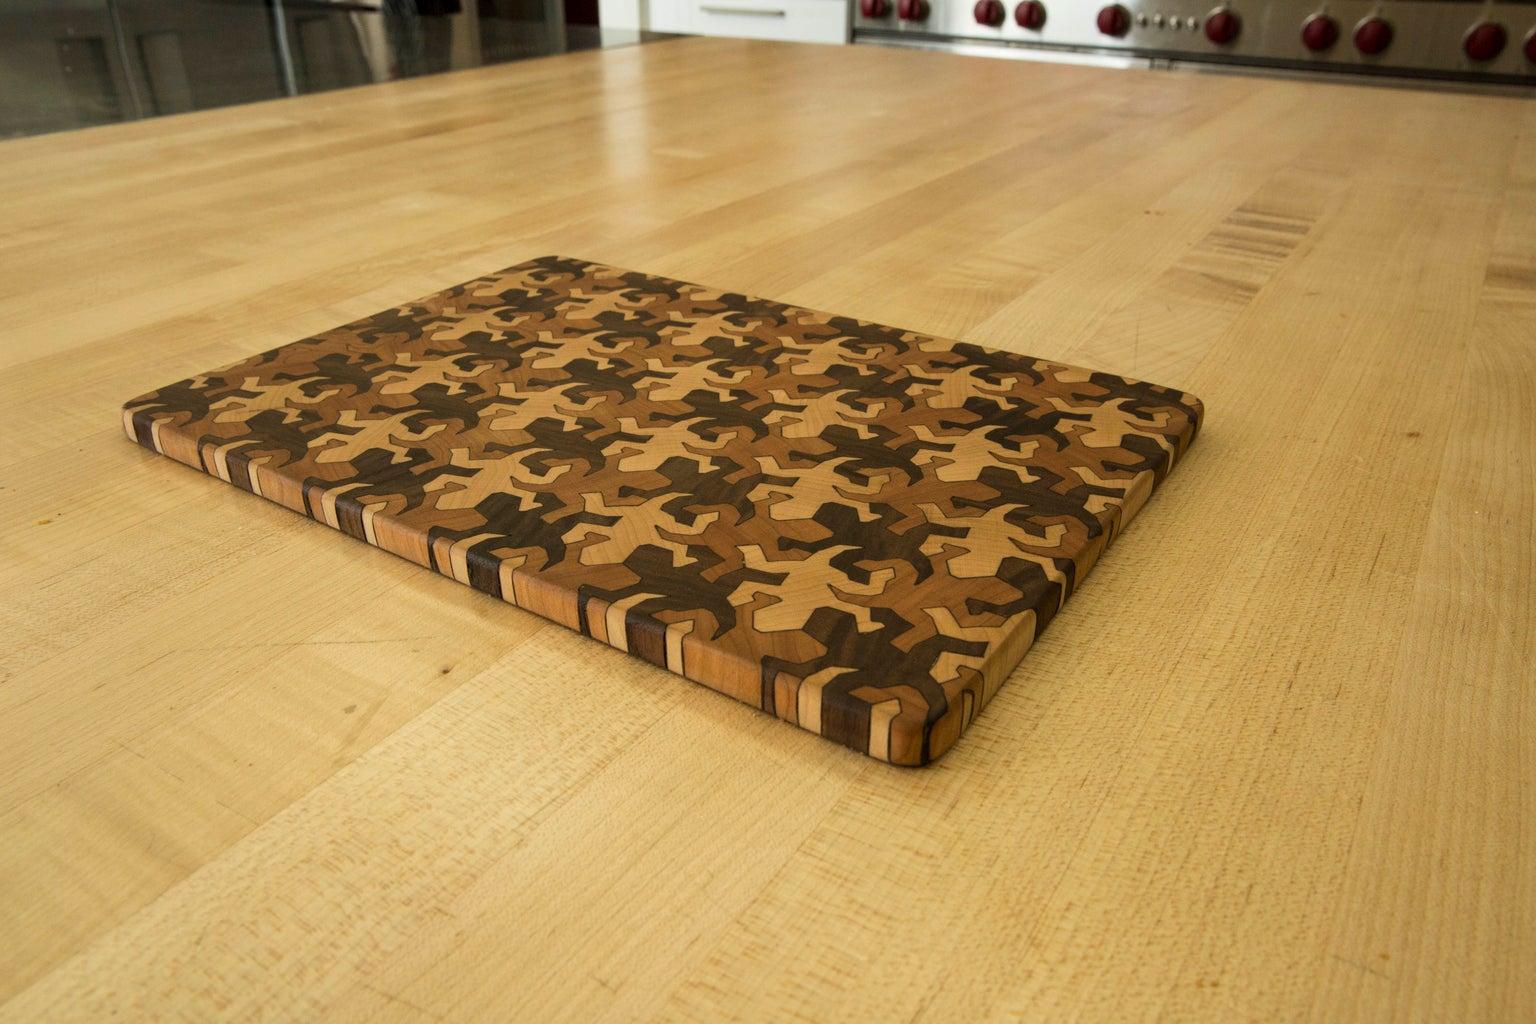 End Grain Cutting Board Using MC Escher Tessellations